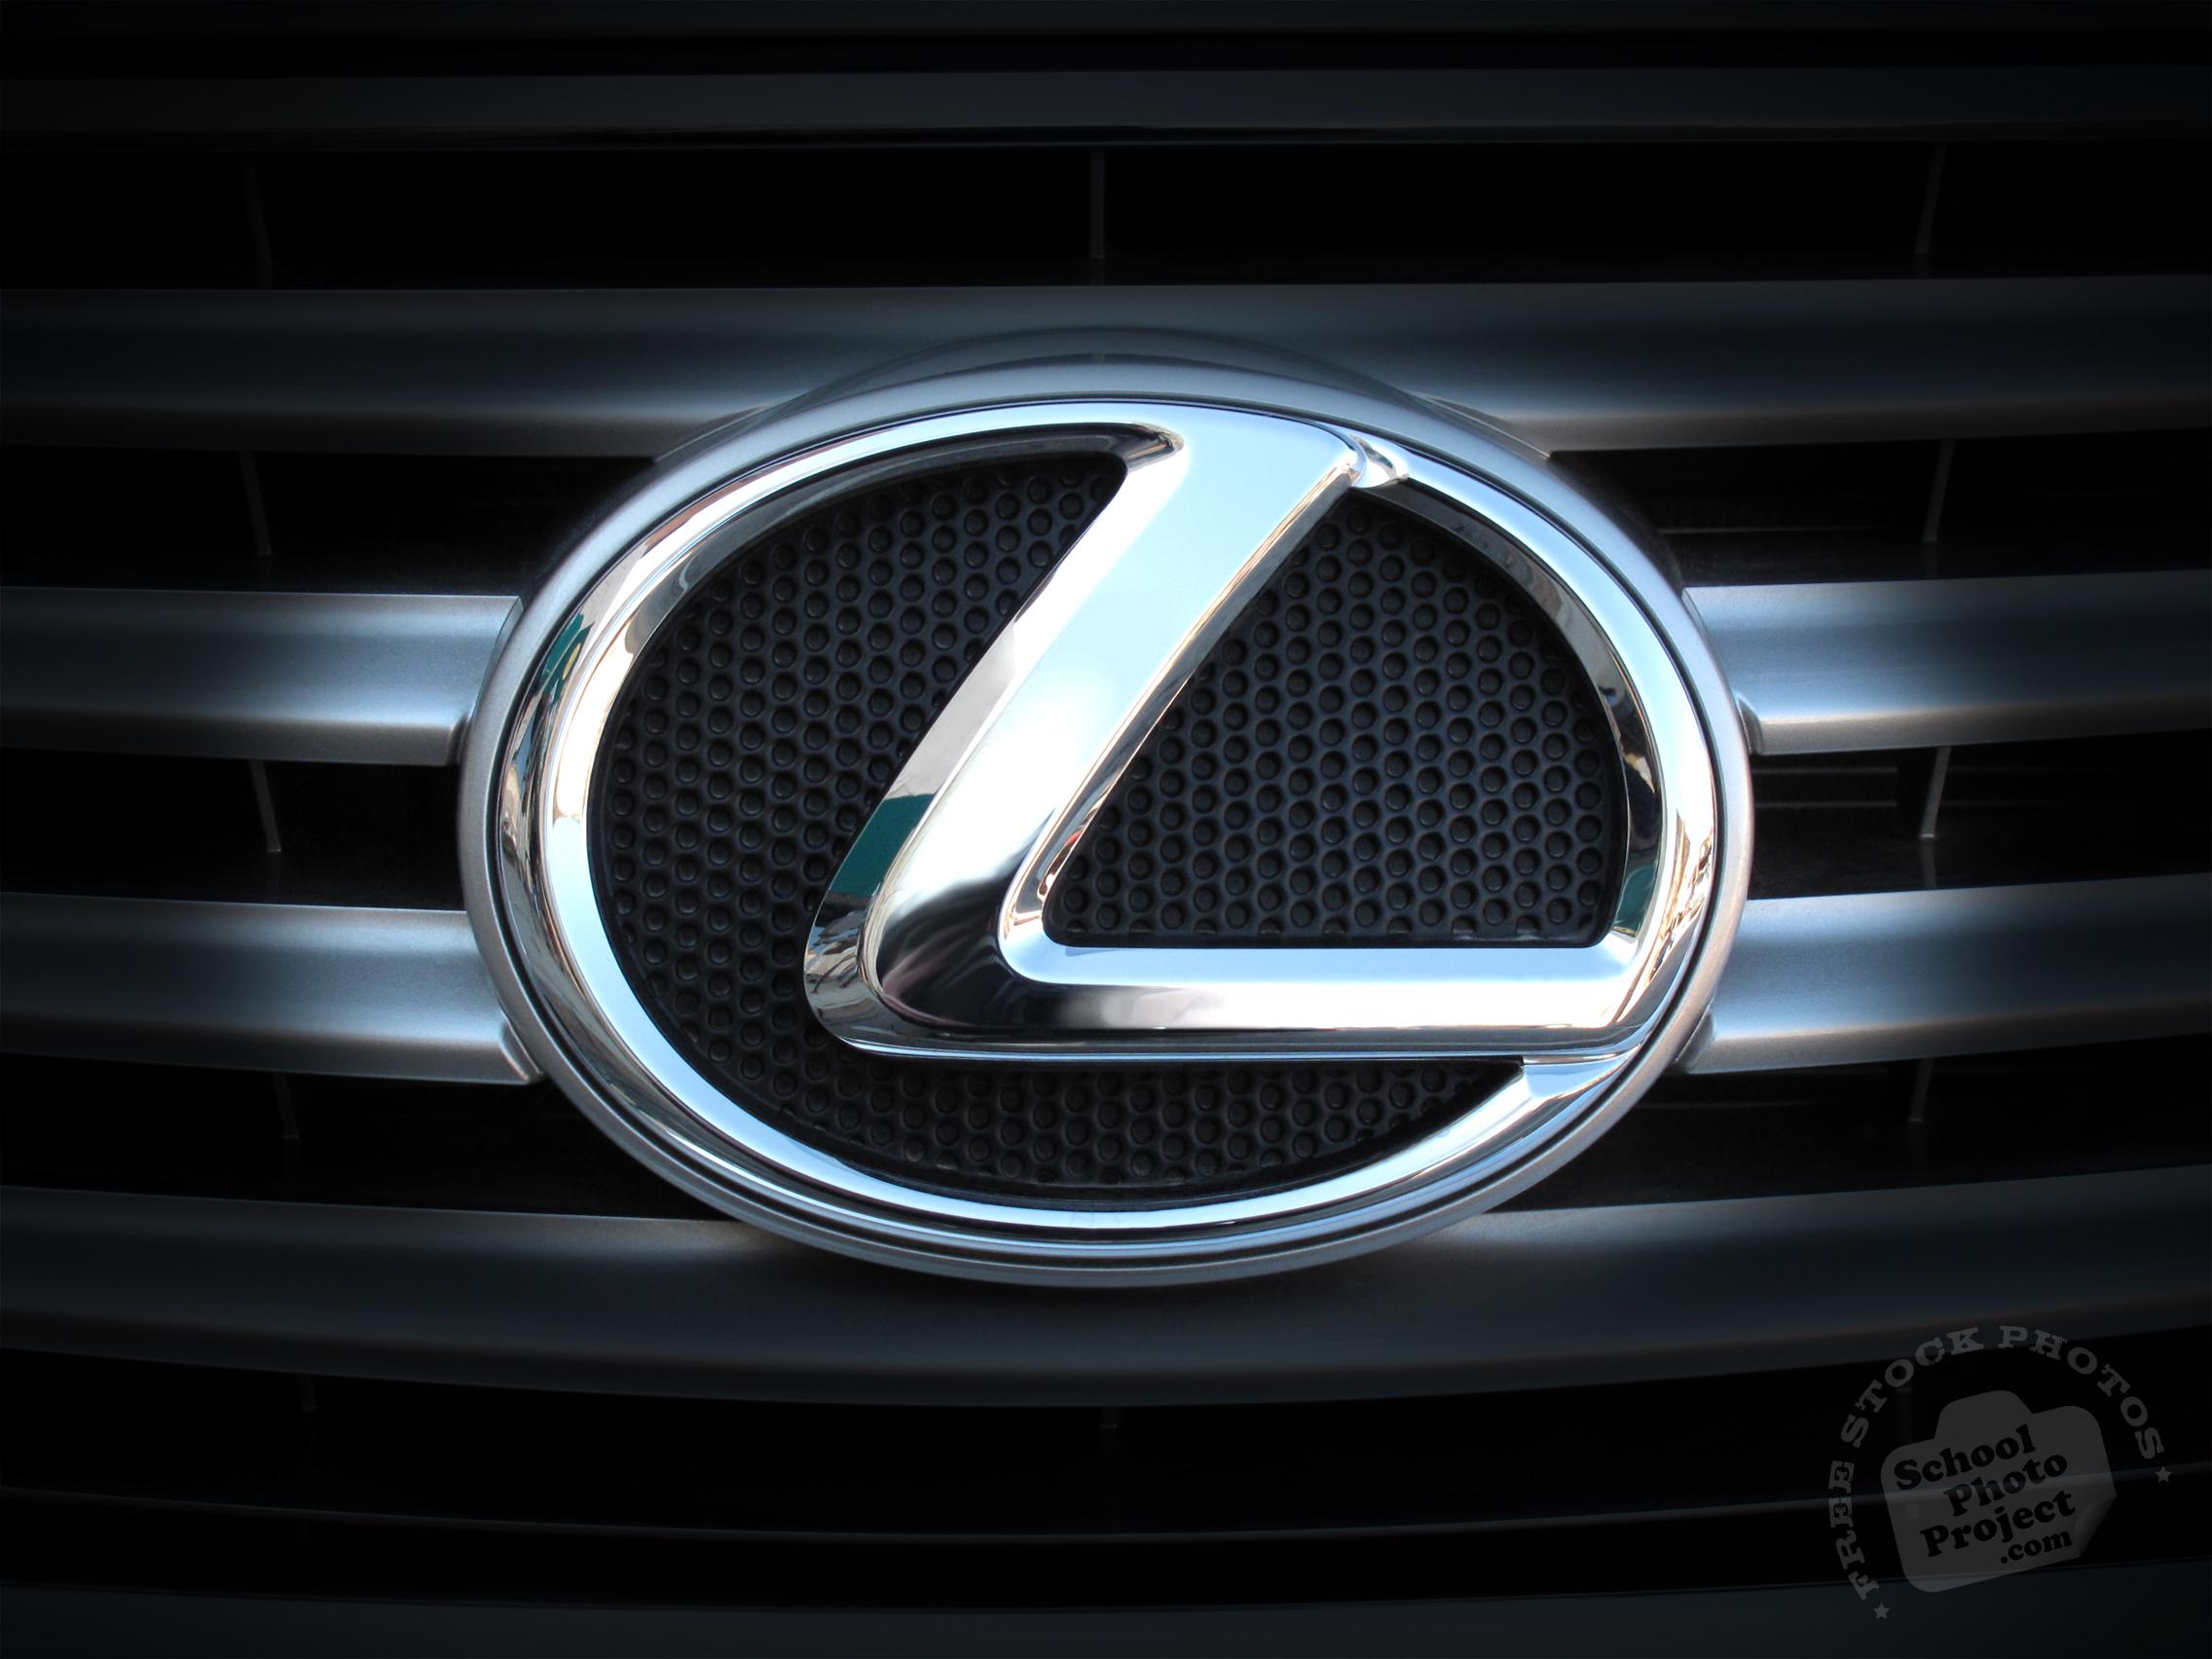 Free Lexus Logo Lexus Car Brand Famous Car Identity Royalty Free